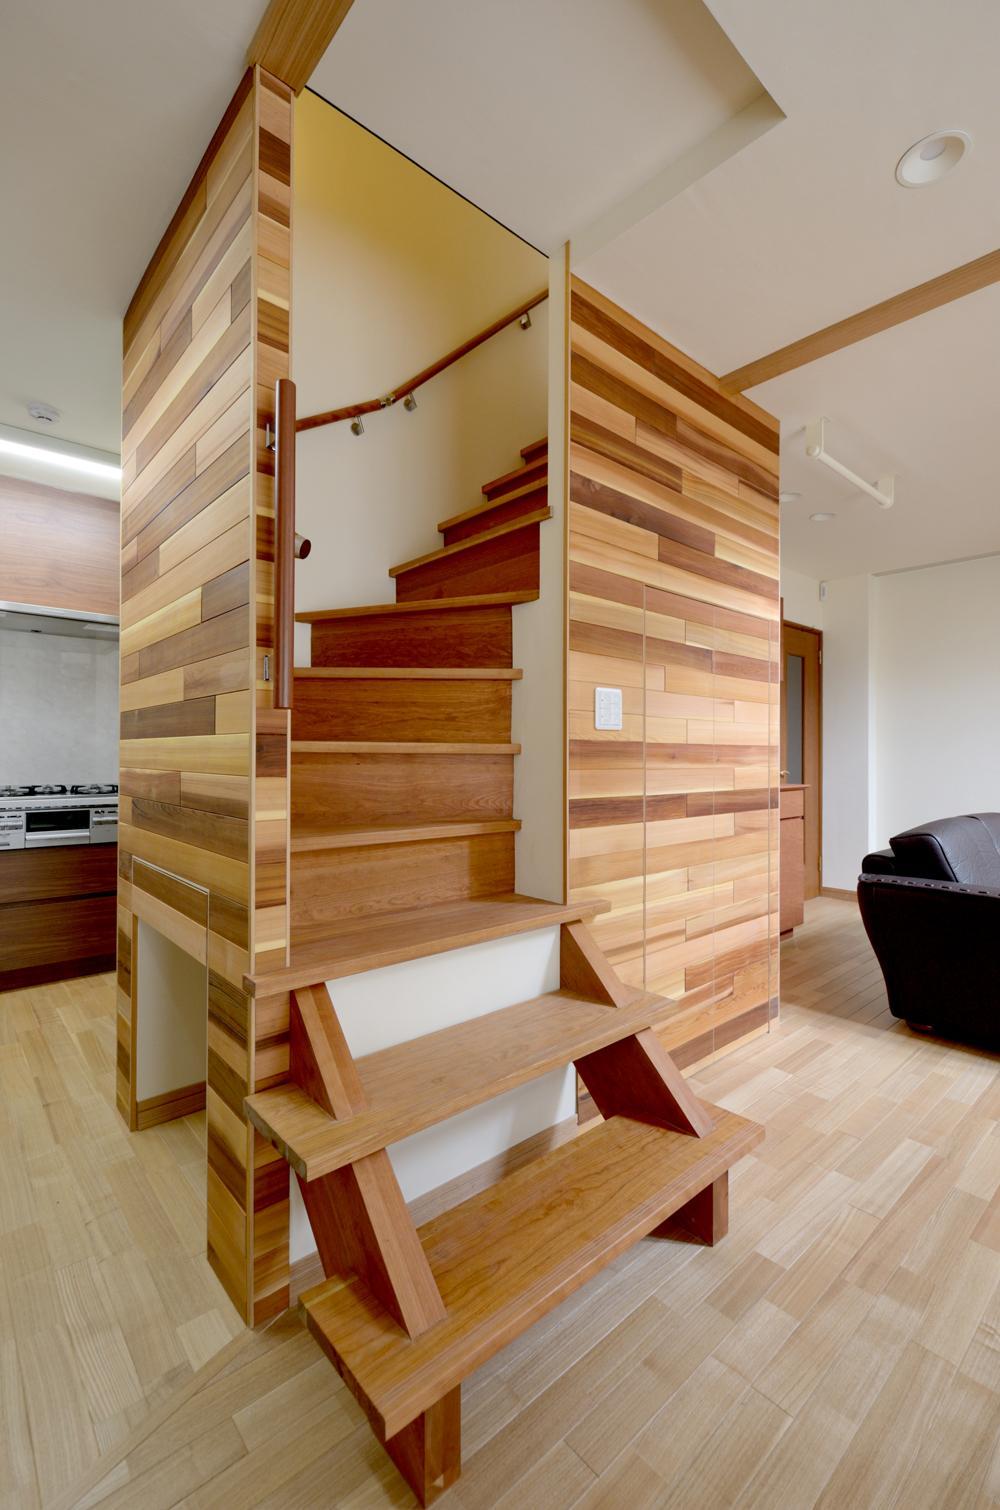 One's Life Renovation「回り階段とセミクローズキッチンで柔らかな家に」